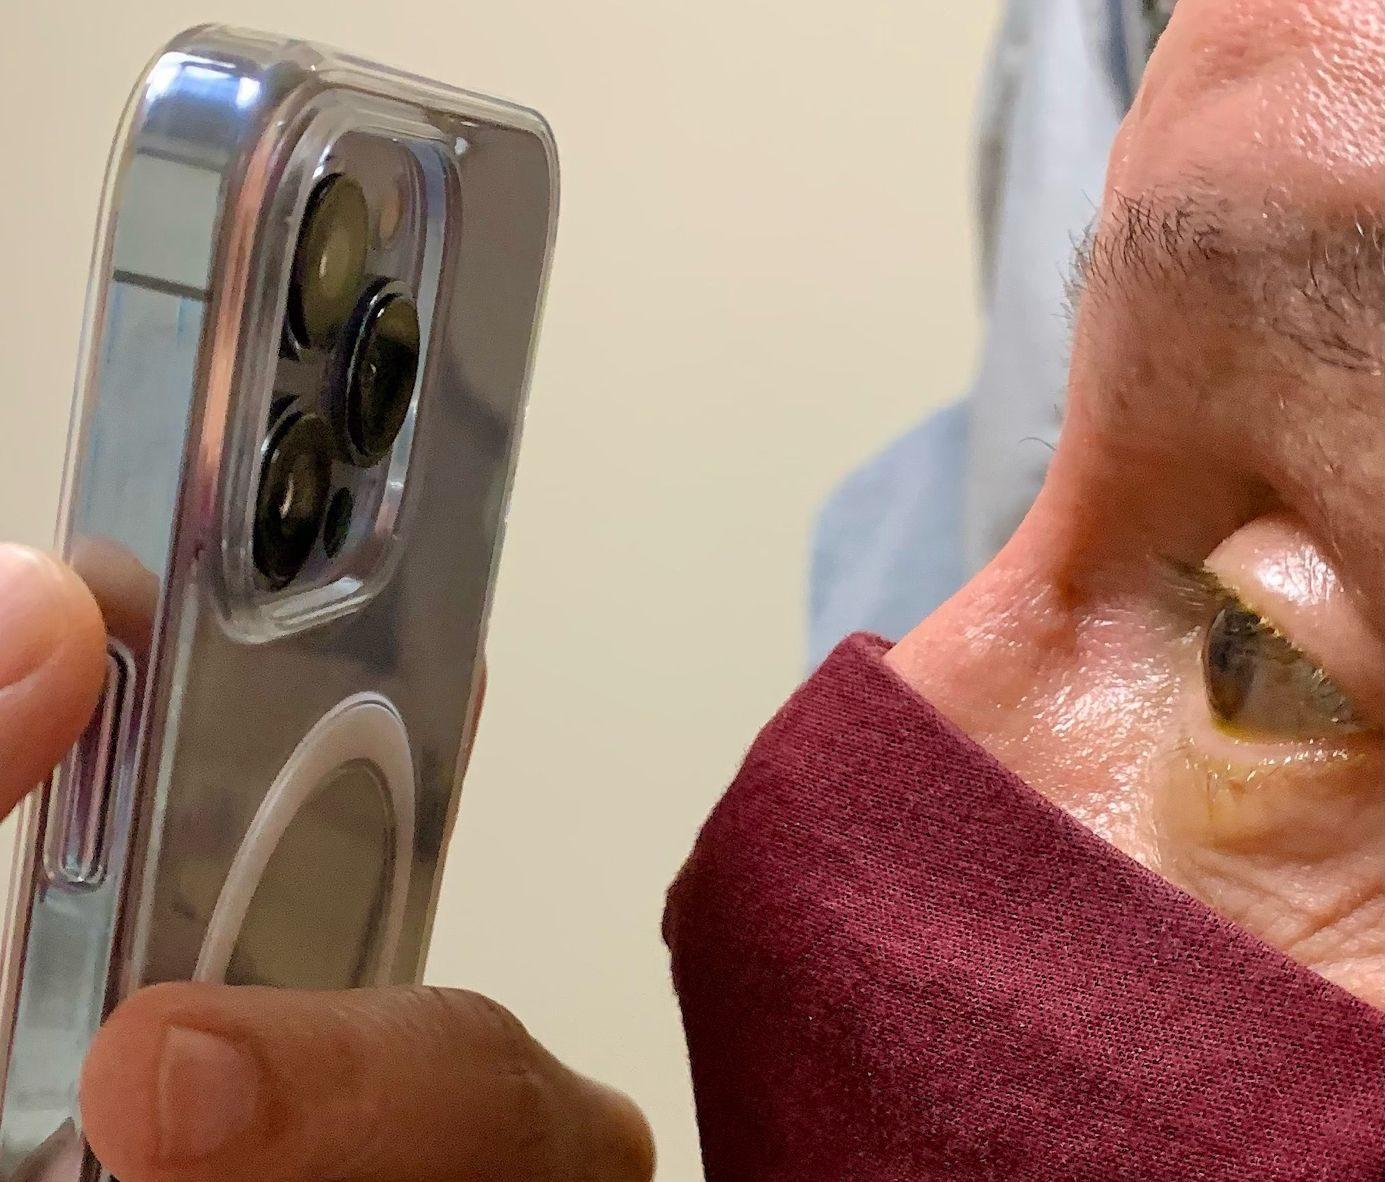 iPhone 13 Pro Max: Γιατρός το χρησιμοποιεί για εξέταση ματιών